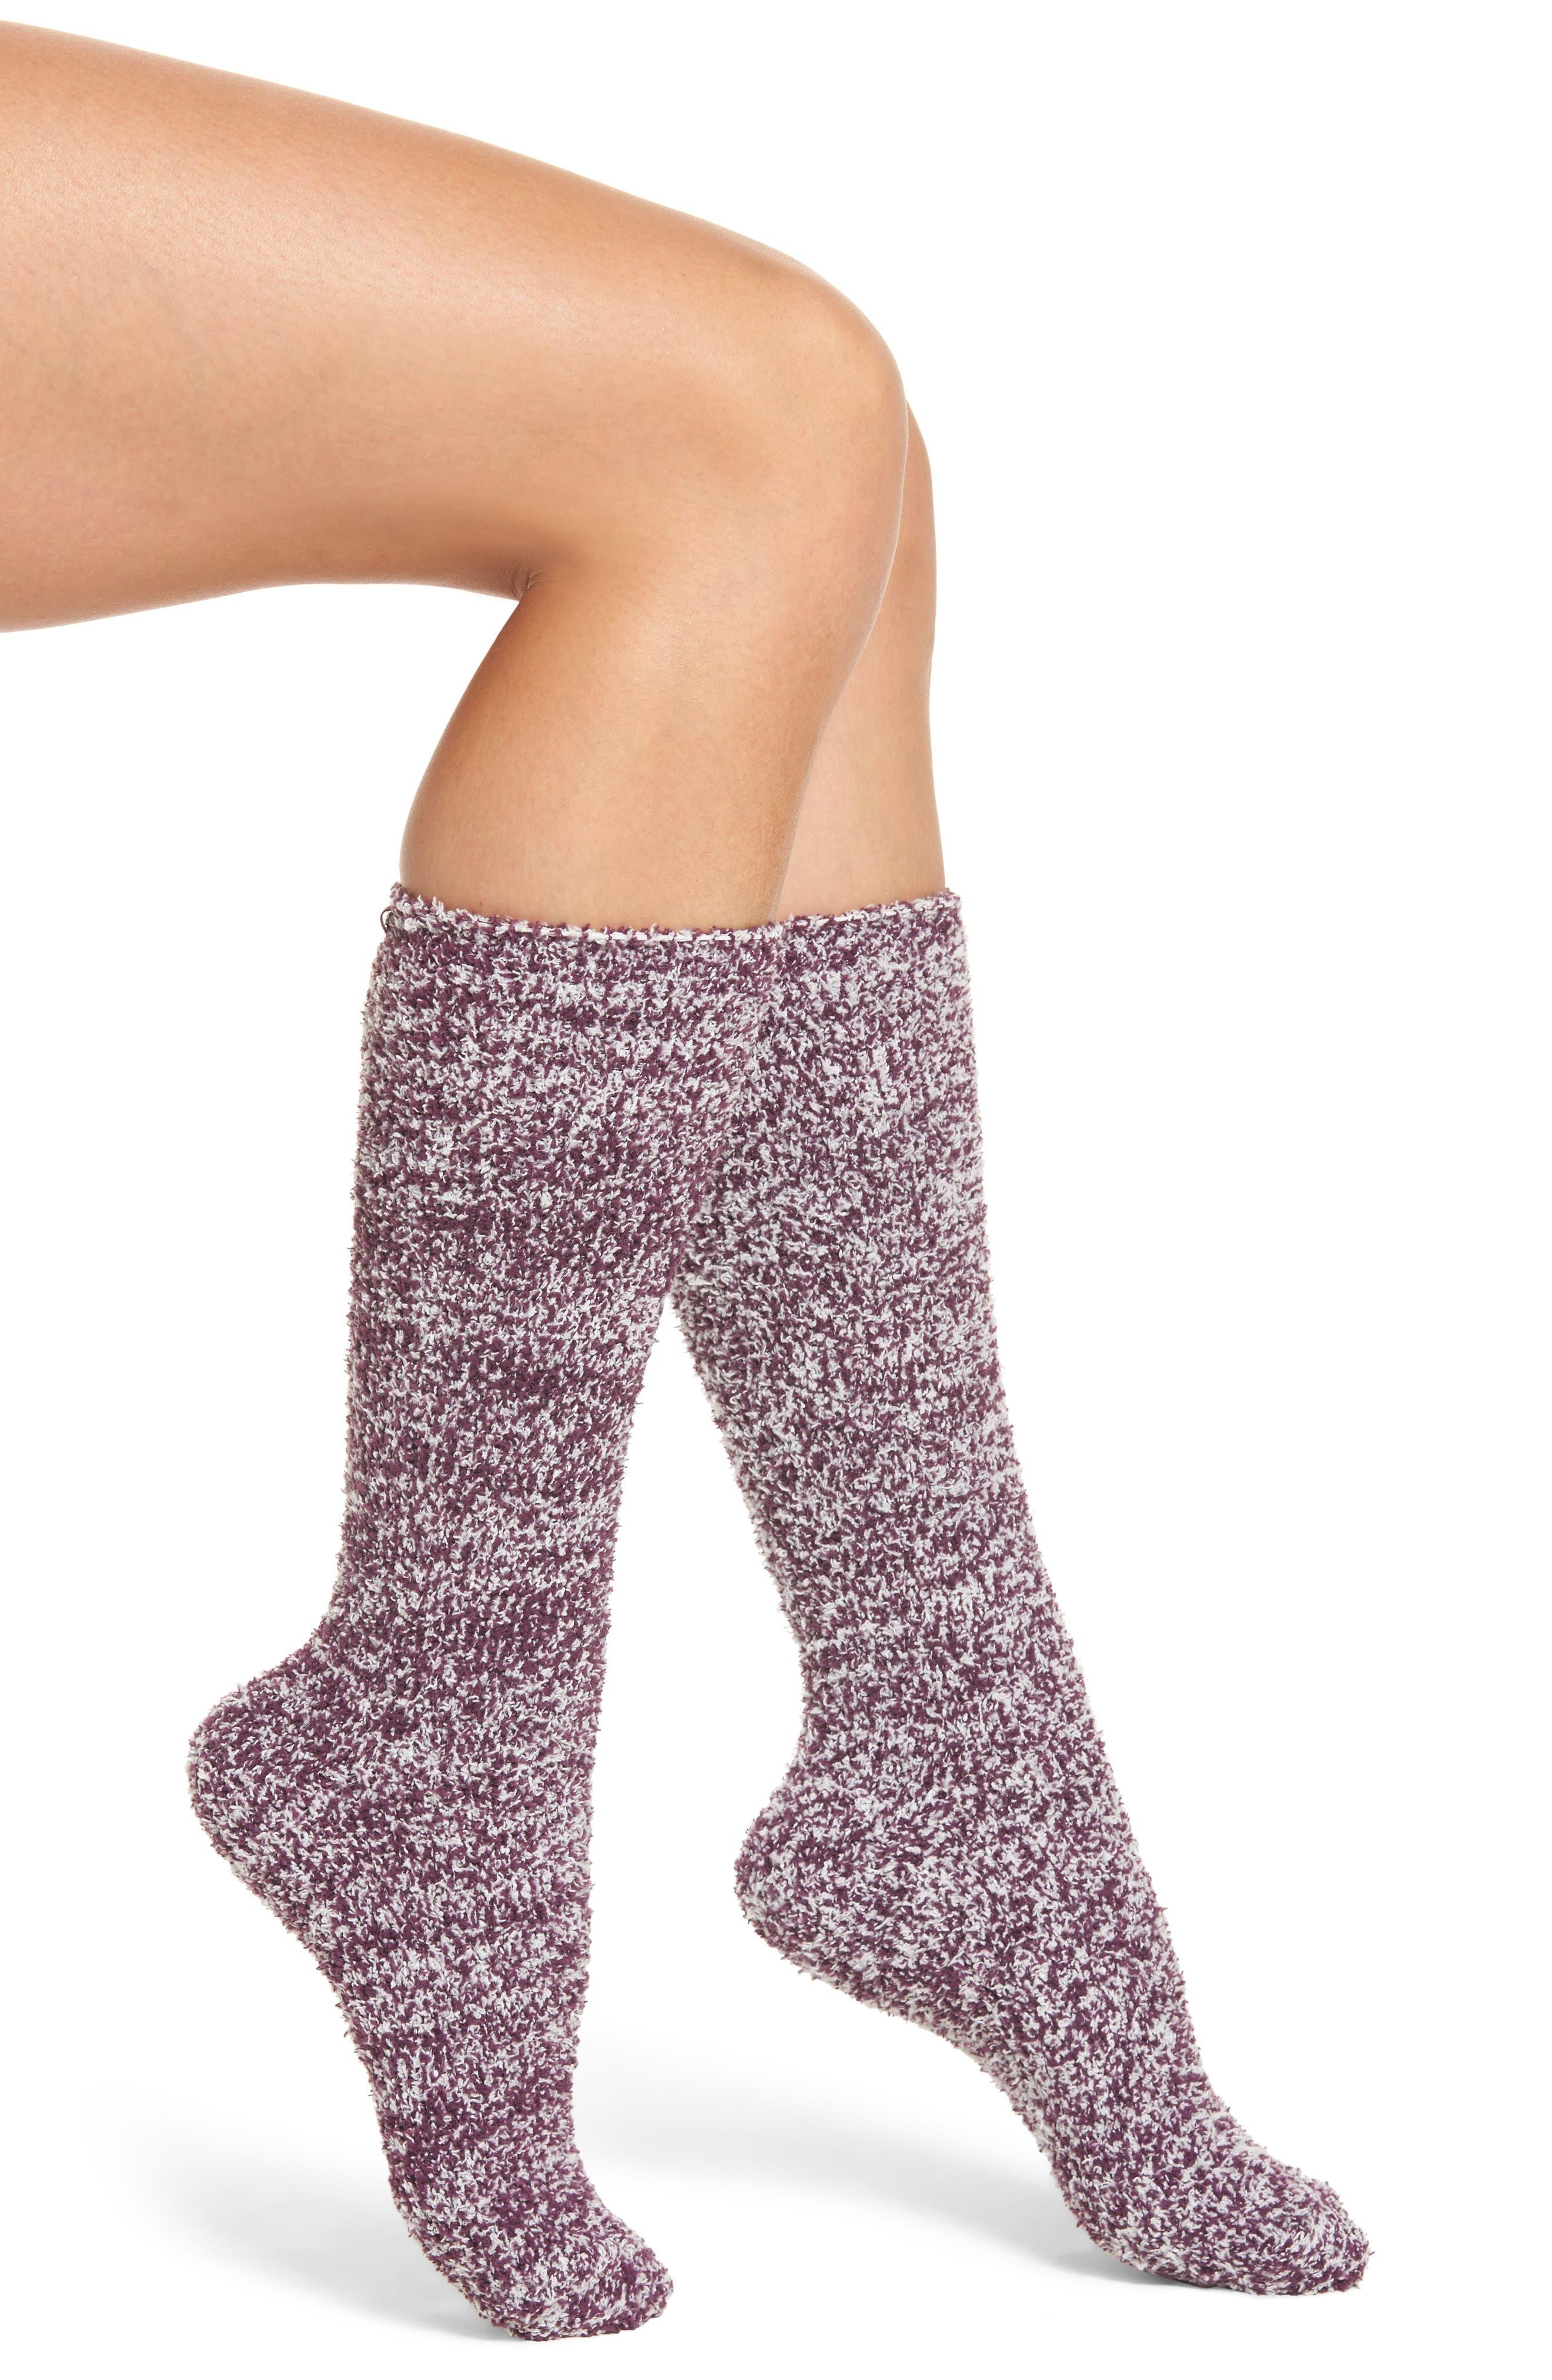 CozyChic<sup>®</sup> Socks,                         Main,                         color, Velvet Plum/ White